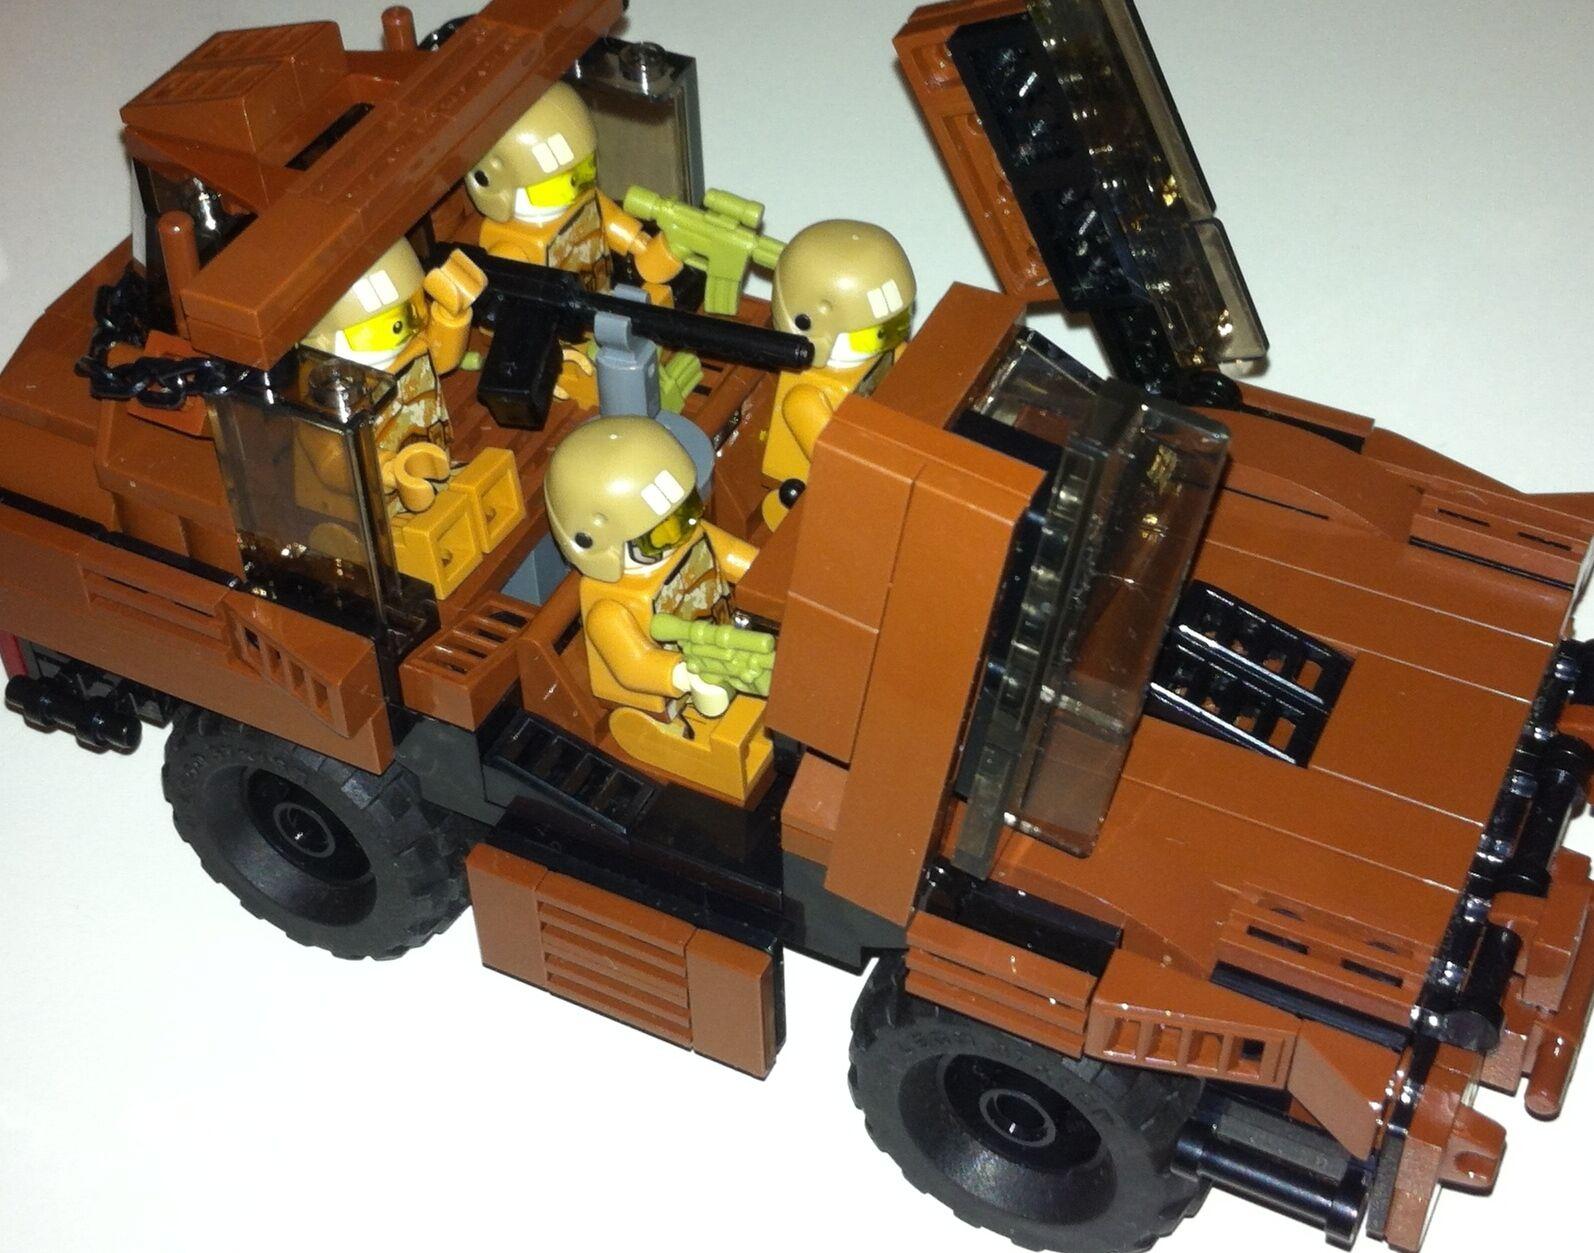 ORIGINALE Lego nuove parti - 4 SOLDATI + AUTOBLINDA-IL MIO Design-Custom Arma